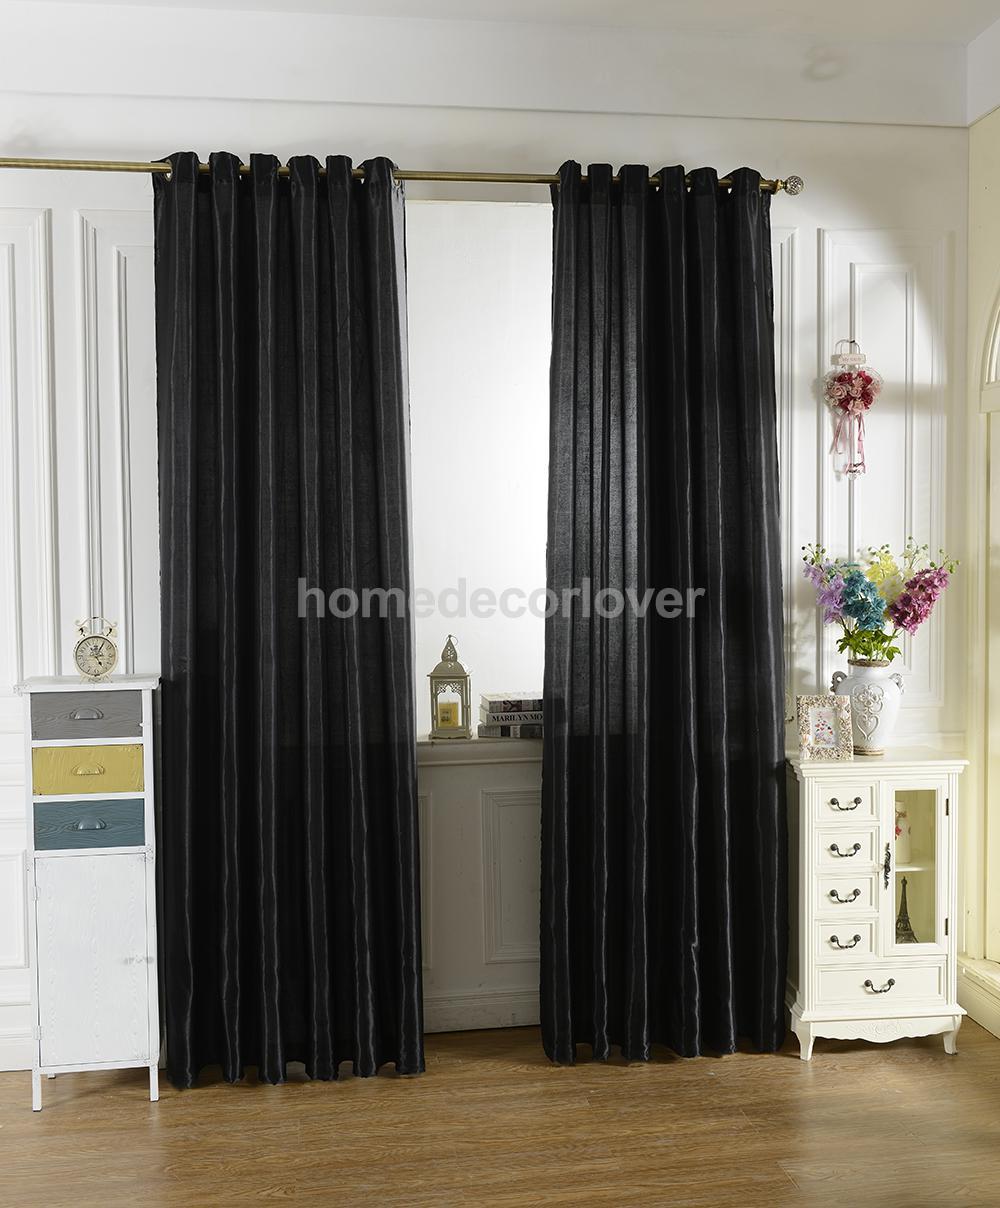 100x250cm Modern Jacquard Window Shade Curtain Room Drape Blind Punch